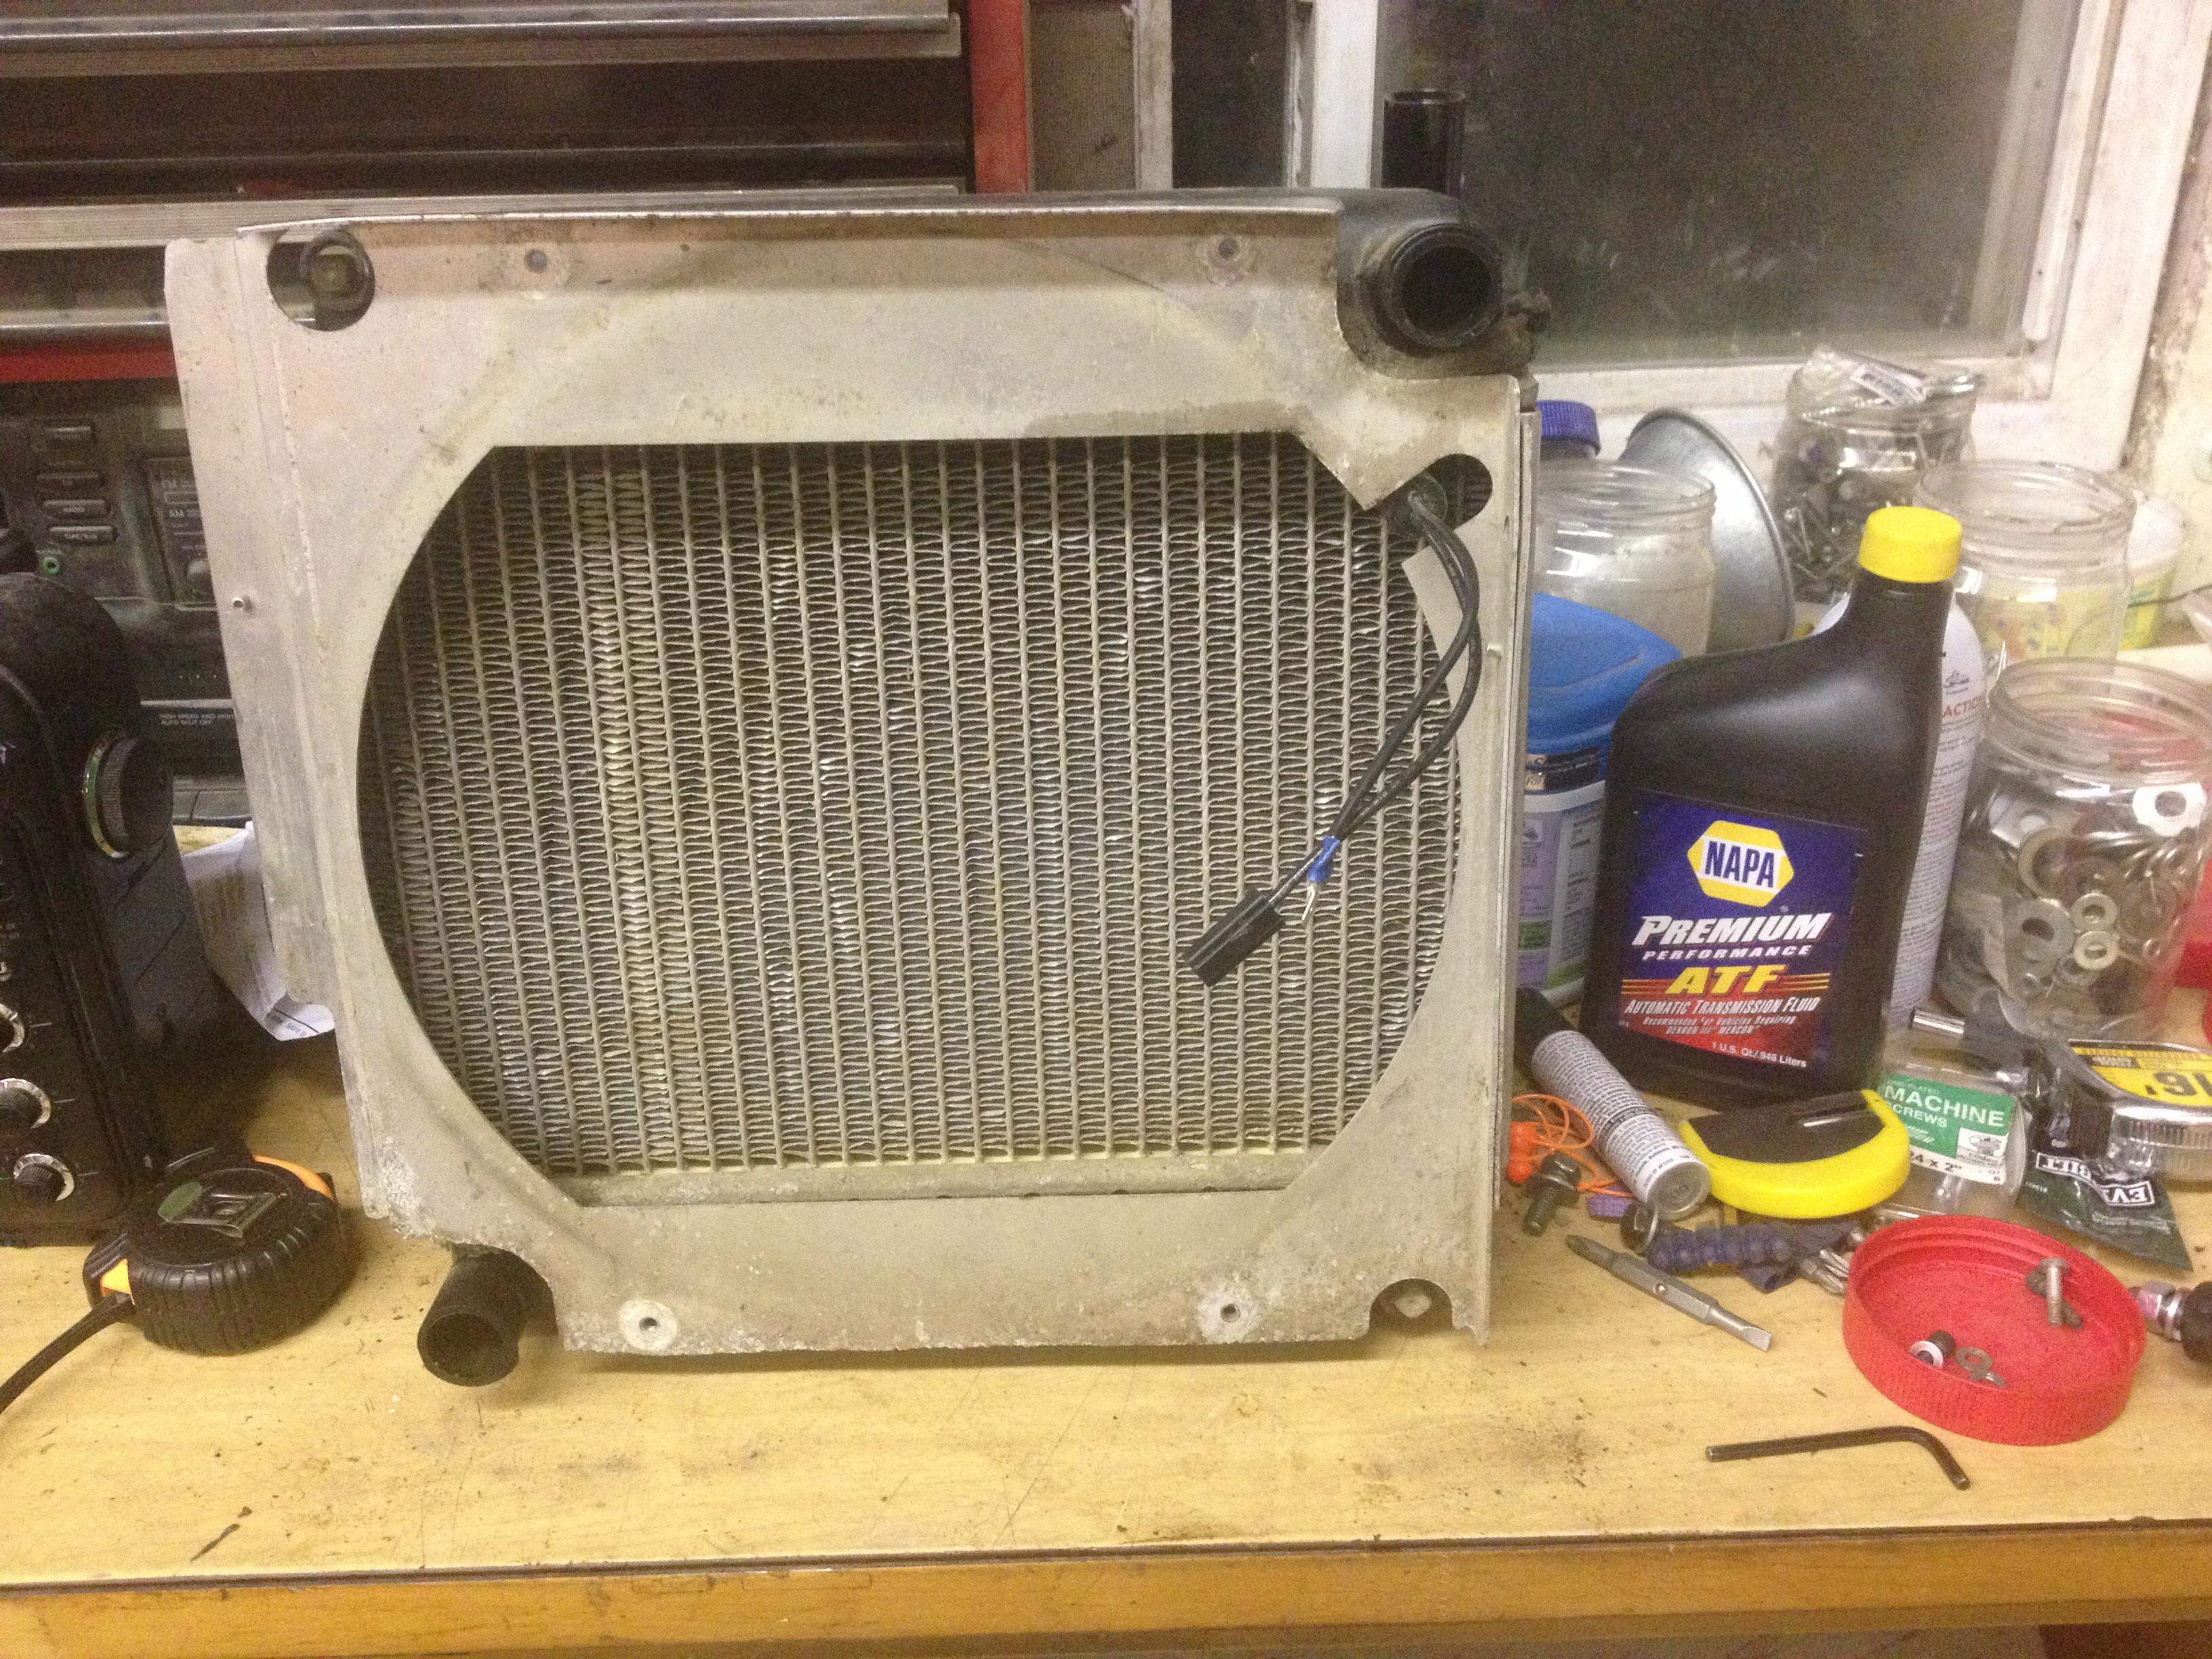 6x4 Diesel Cooling Fan - No Voltage